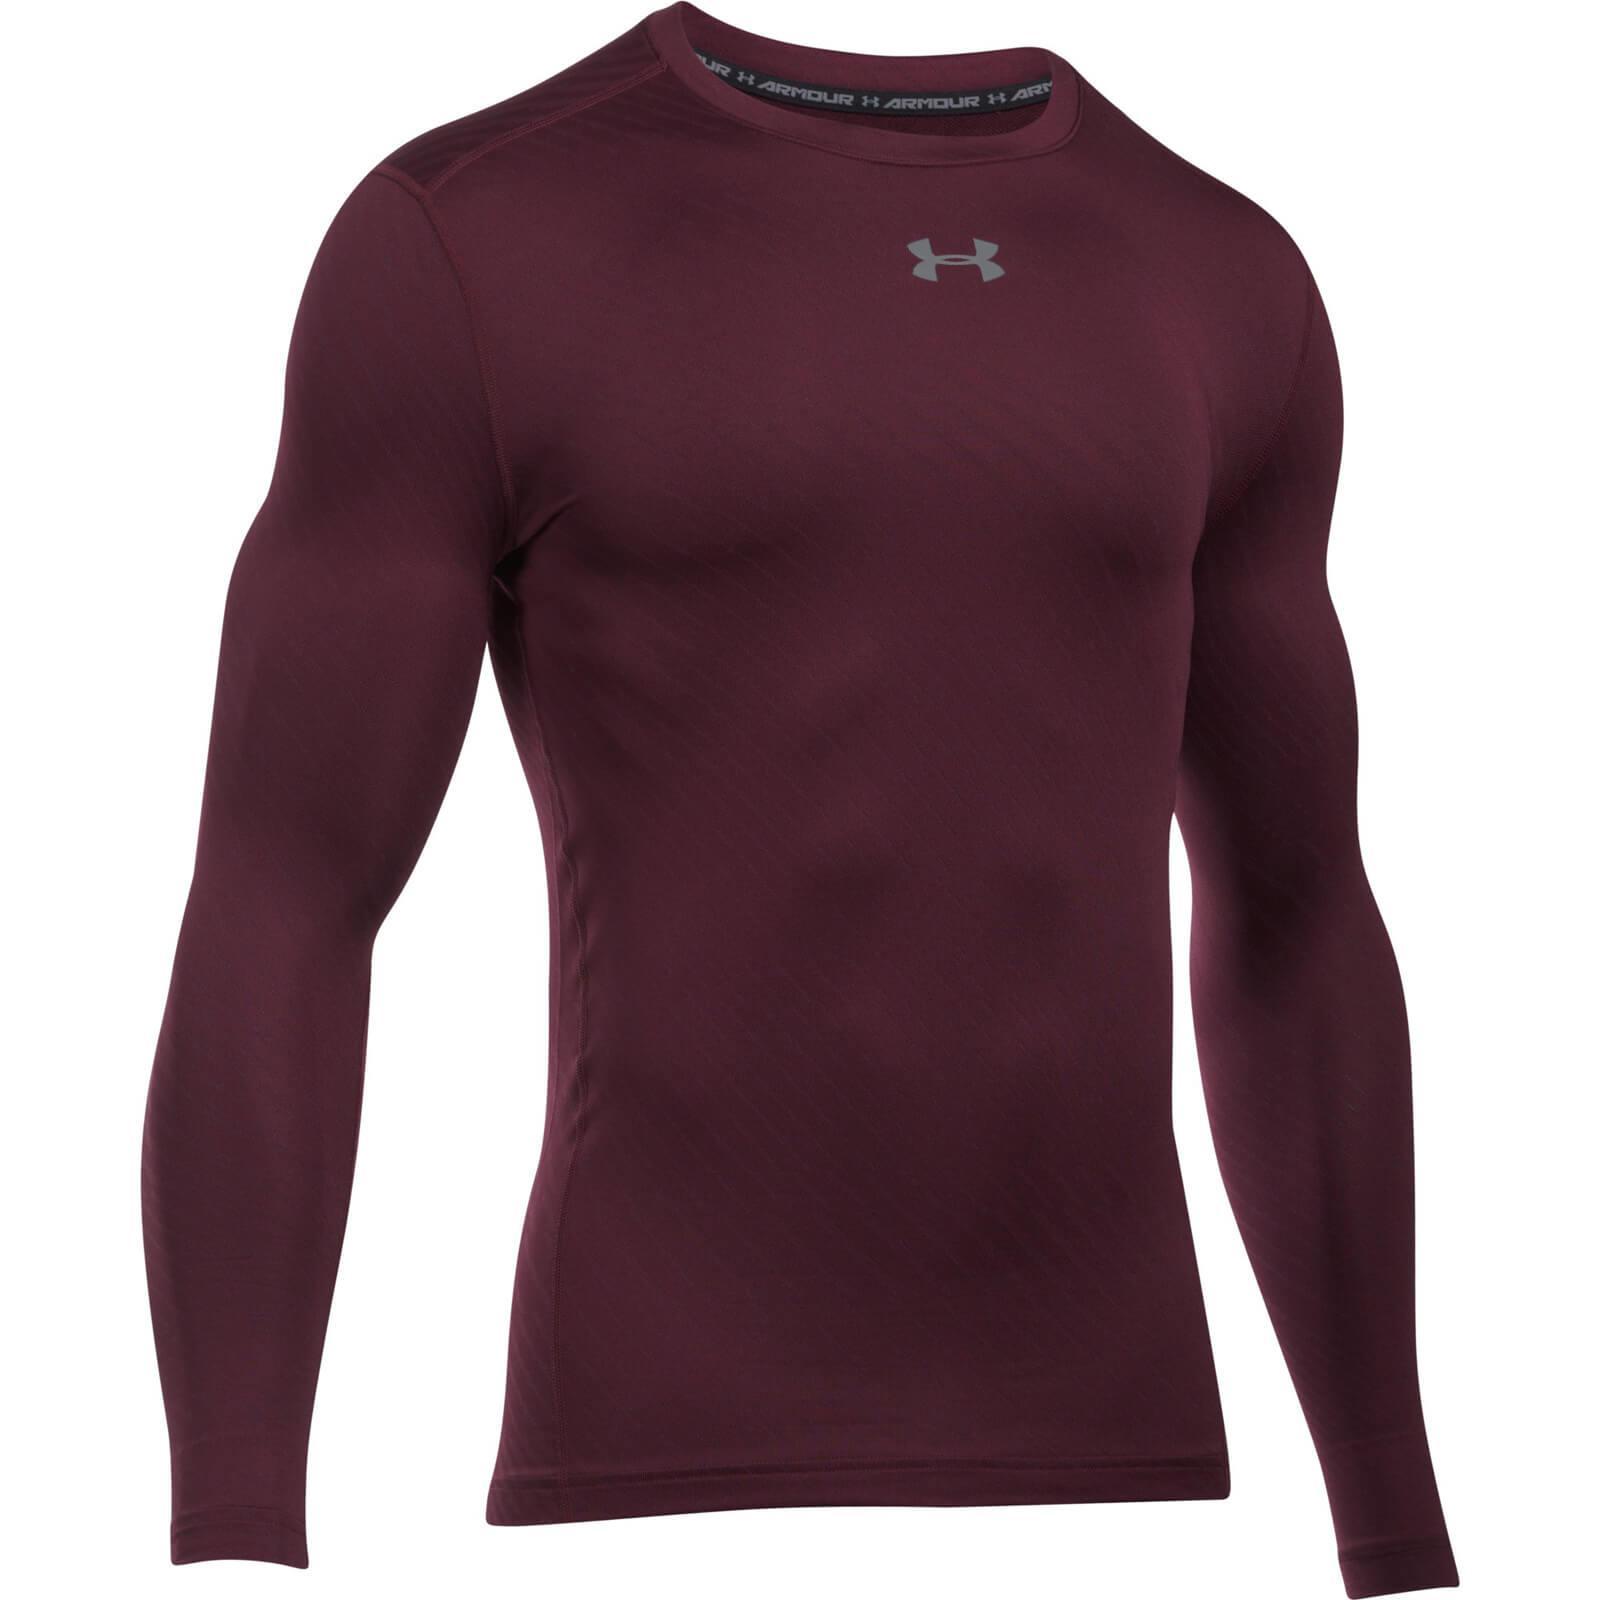 74a8629b7 Big And Tall Long Sleeve Compression Shirts